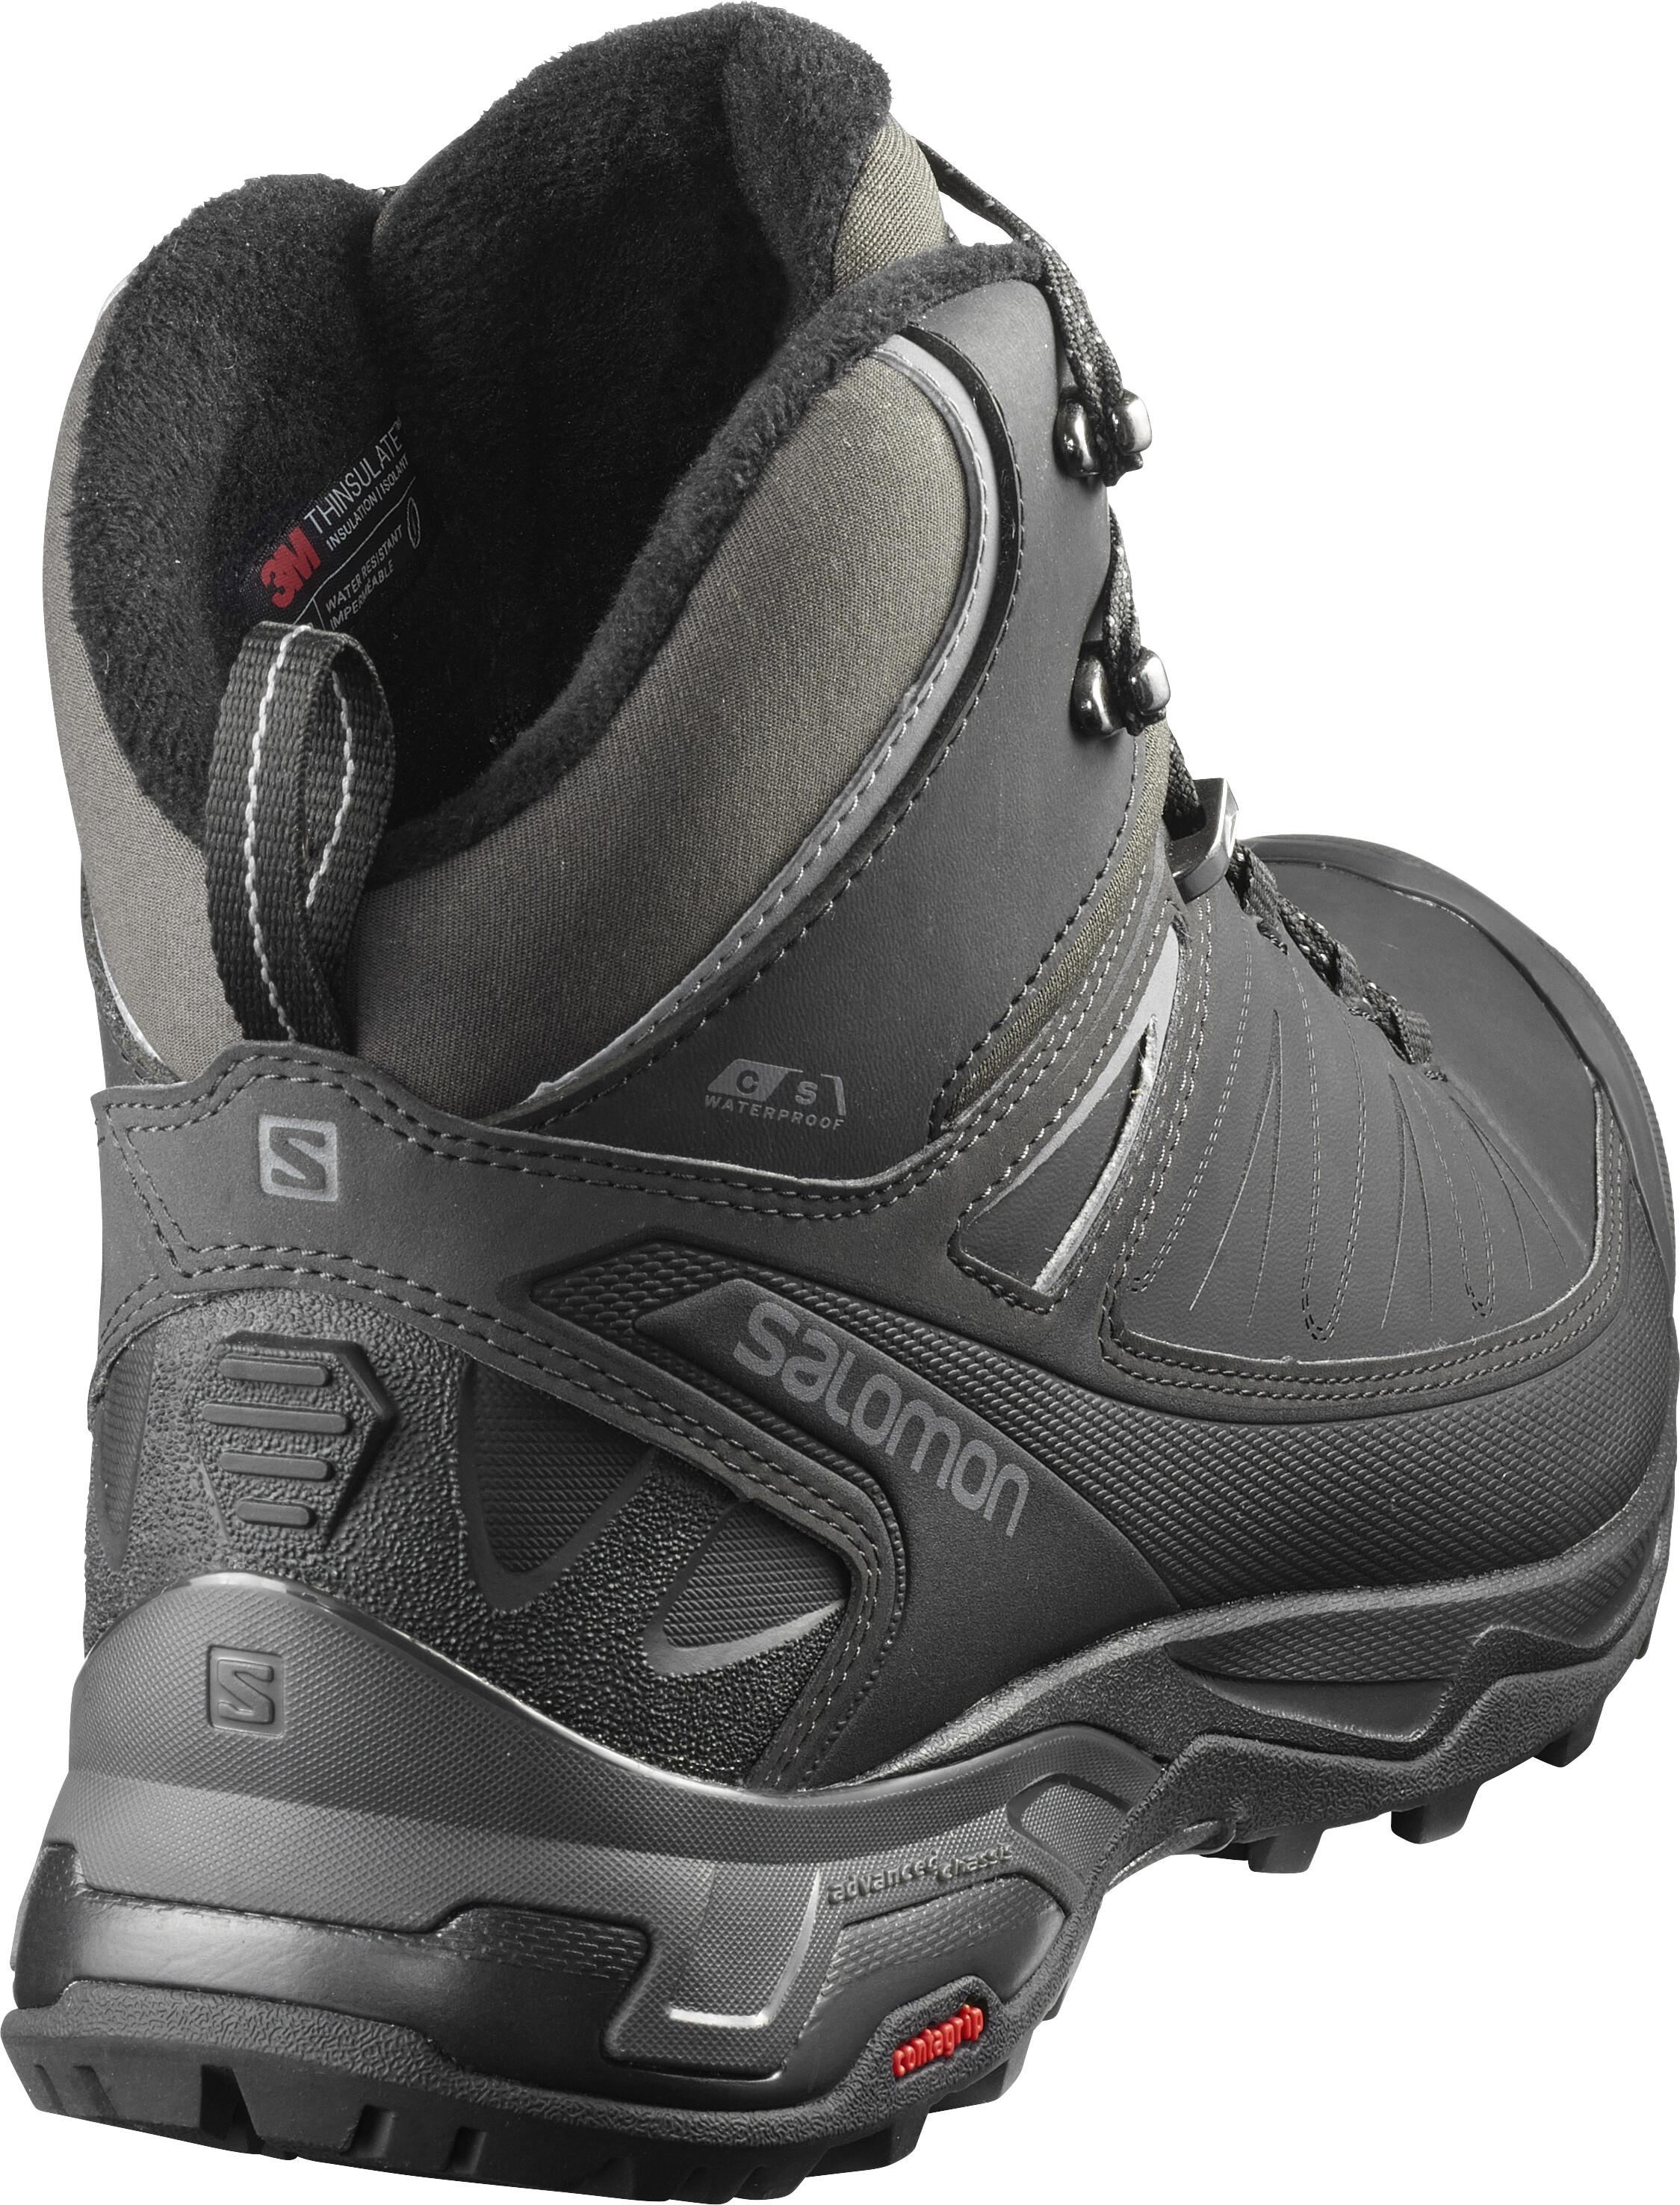 9c373592 Salomon X Ultra Mid CS WP Shoes Men black/phantom/quiet shade at ...